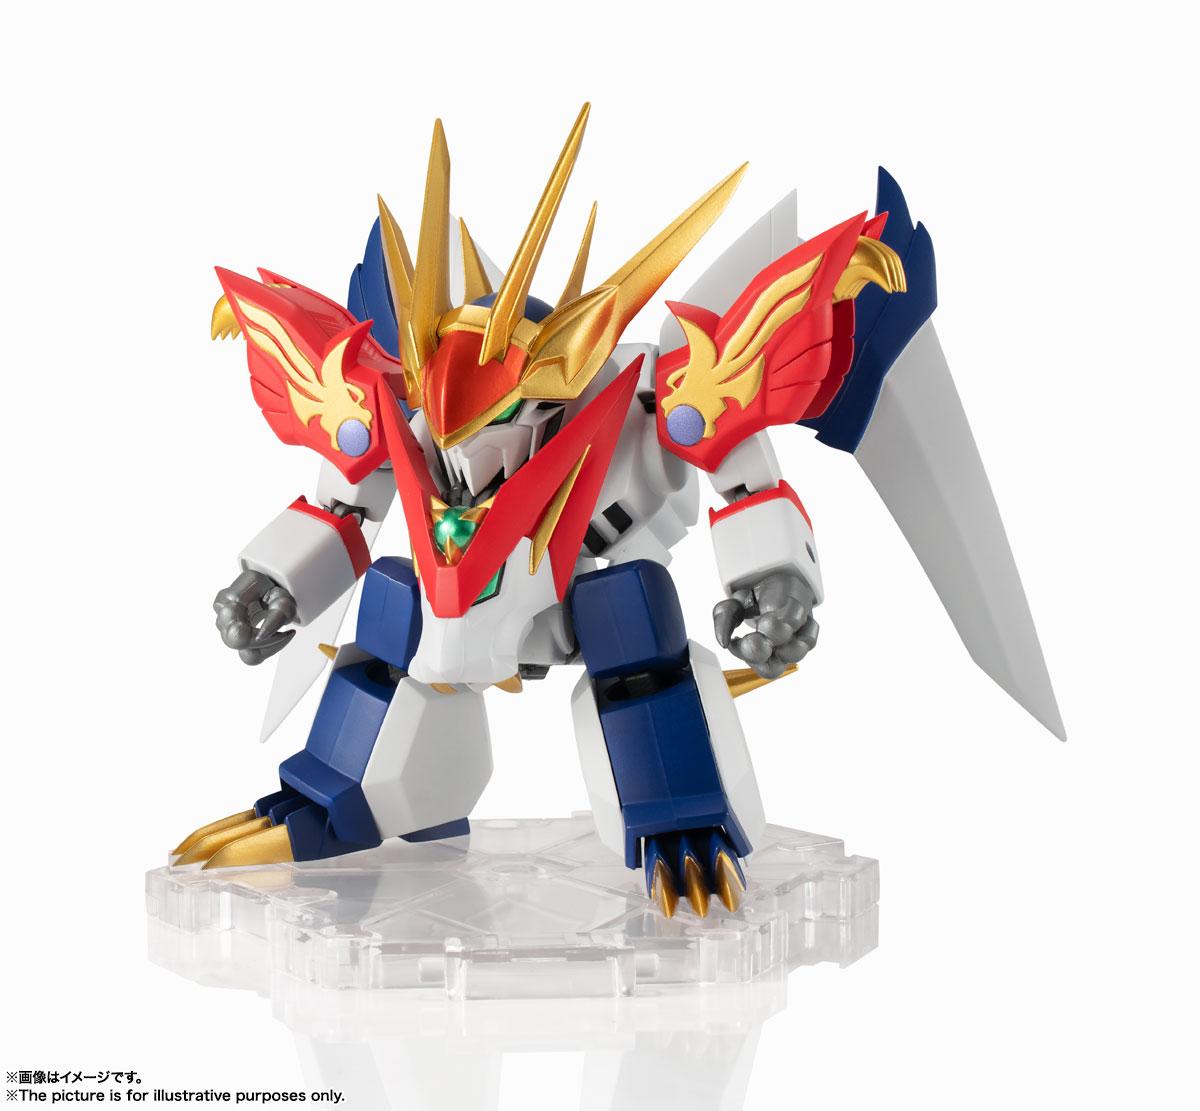 NXEDGE STYLE[MASHIN UNIT]『龍虎丸』魔神英雄伝ワタル 可動フィギュア-001